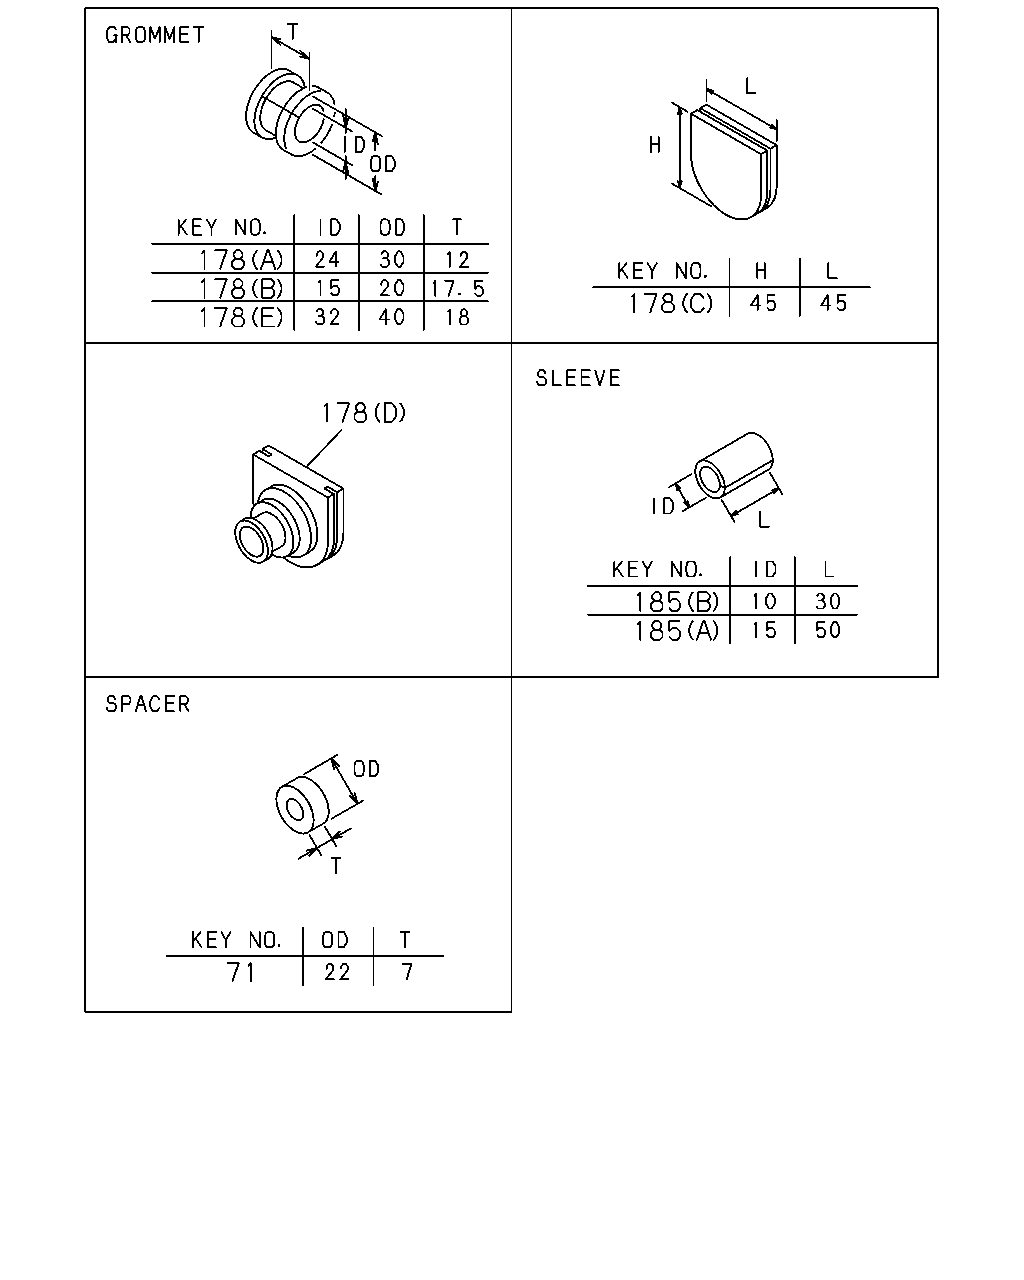 Wiring Diagram Grommet Key Guide And Troubleshooting Of Symbol Diagrams Scematic Rh 51 Jessicadonath De O2 Sensor